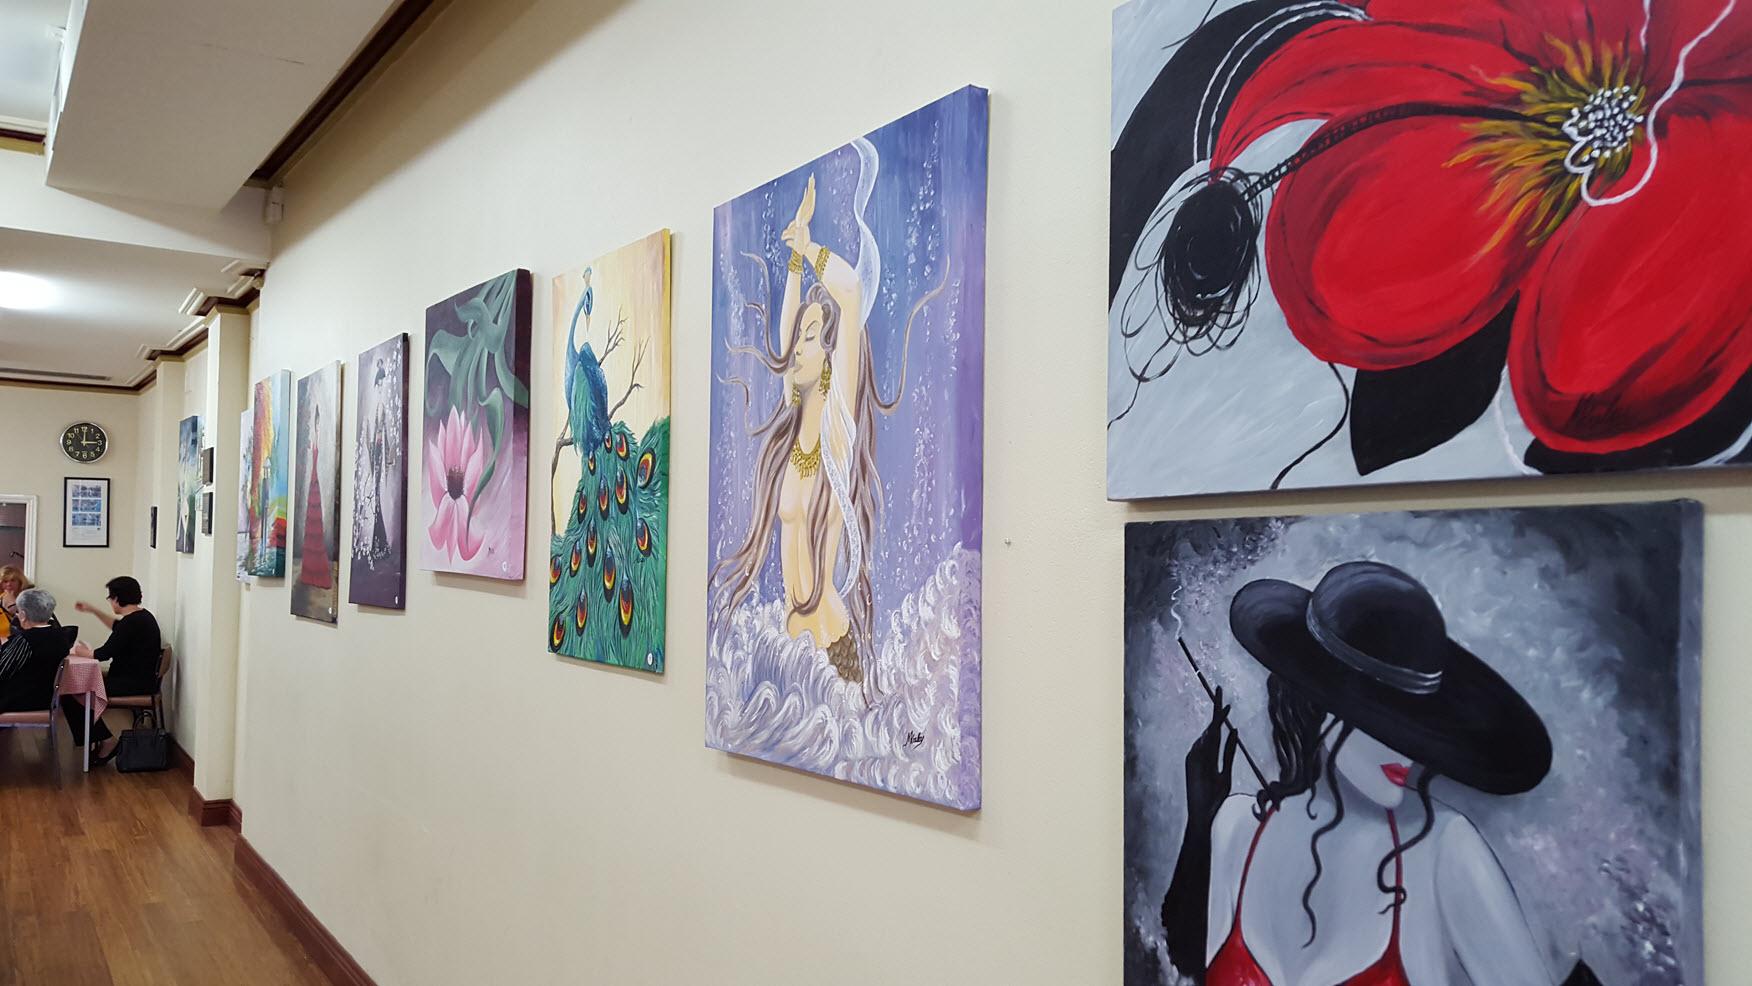 More colour along the wall